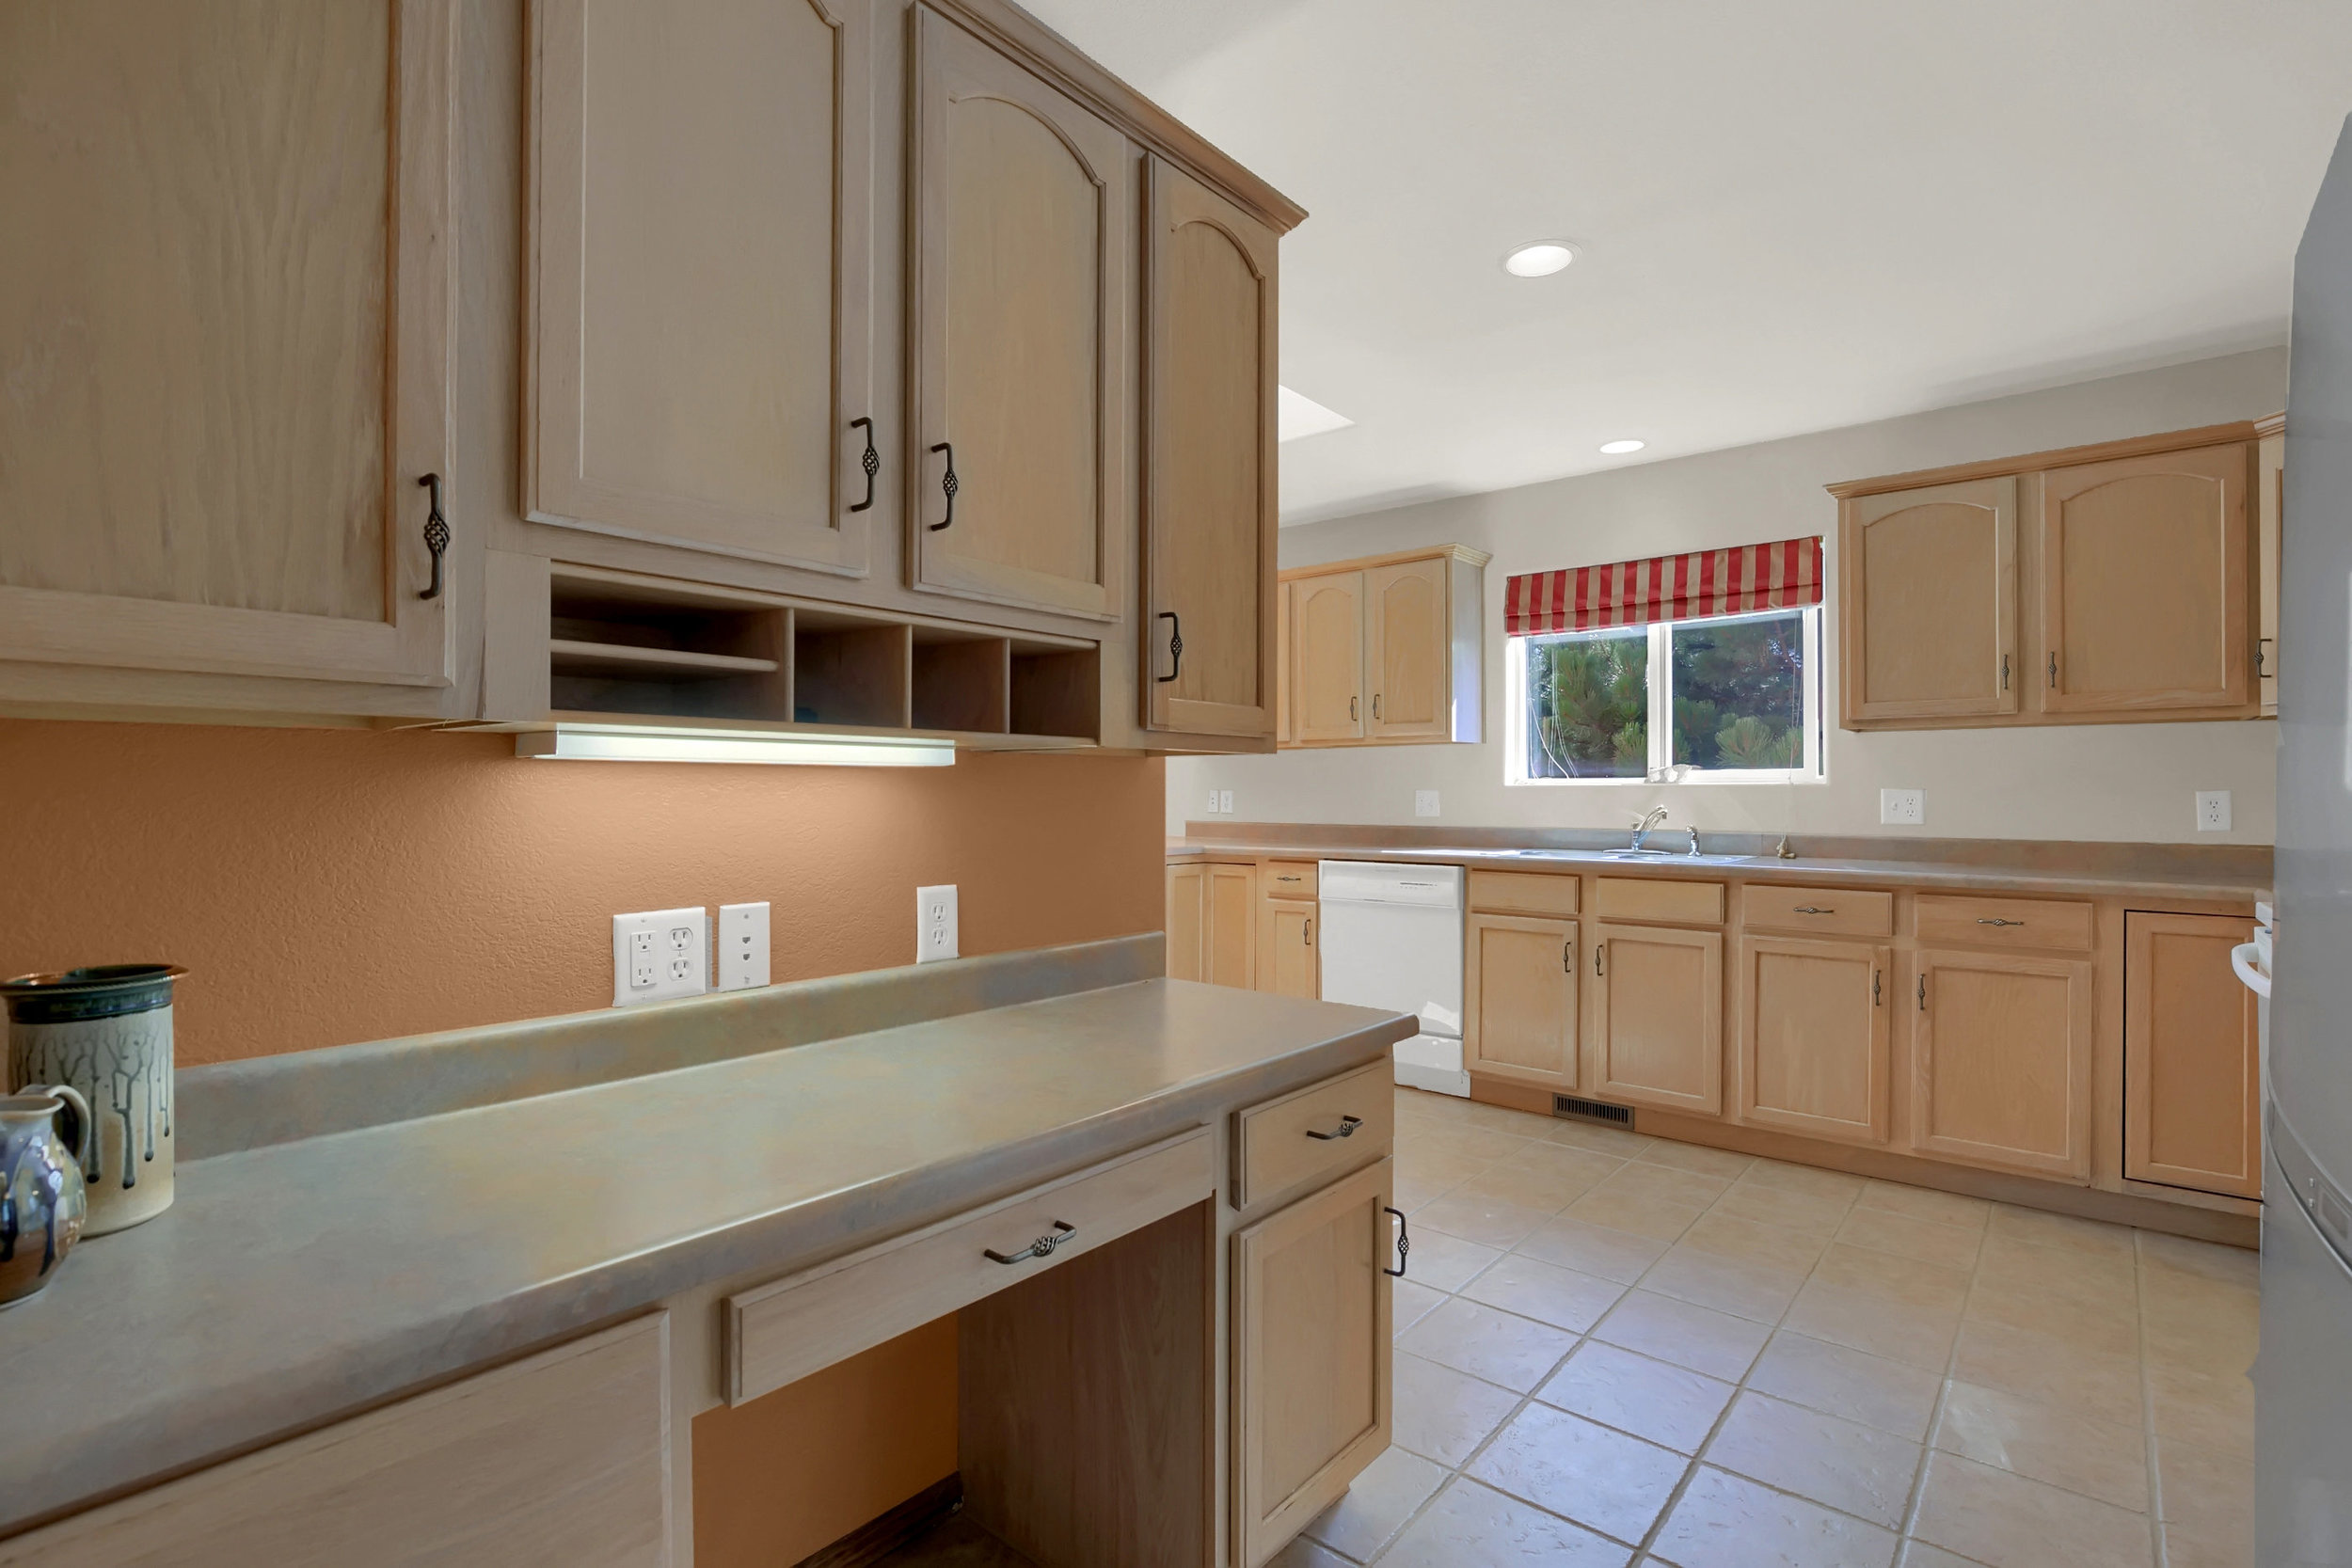 1605 Vickers Drive Colorado-print-011-007-Kitchen-2800x1867-300dpi.jpg